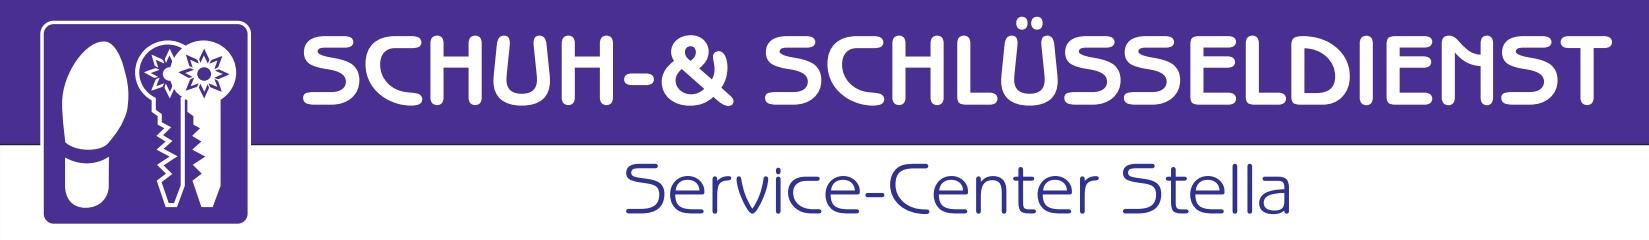 Service-Center-Stella